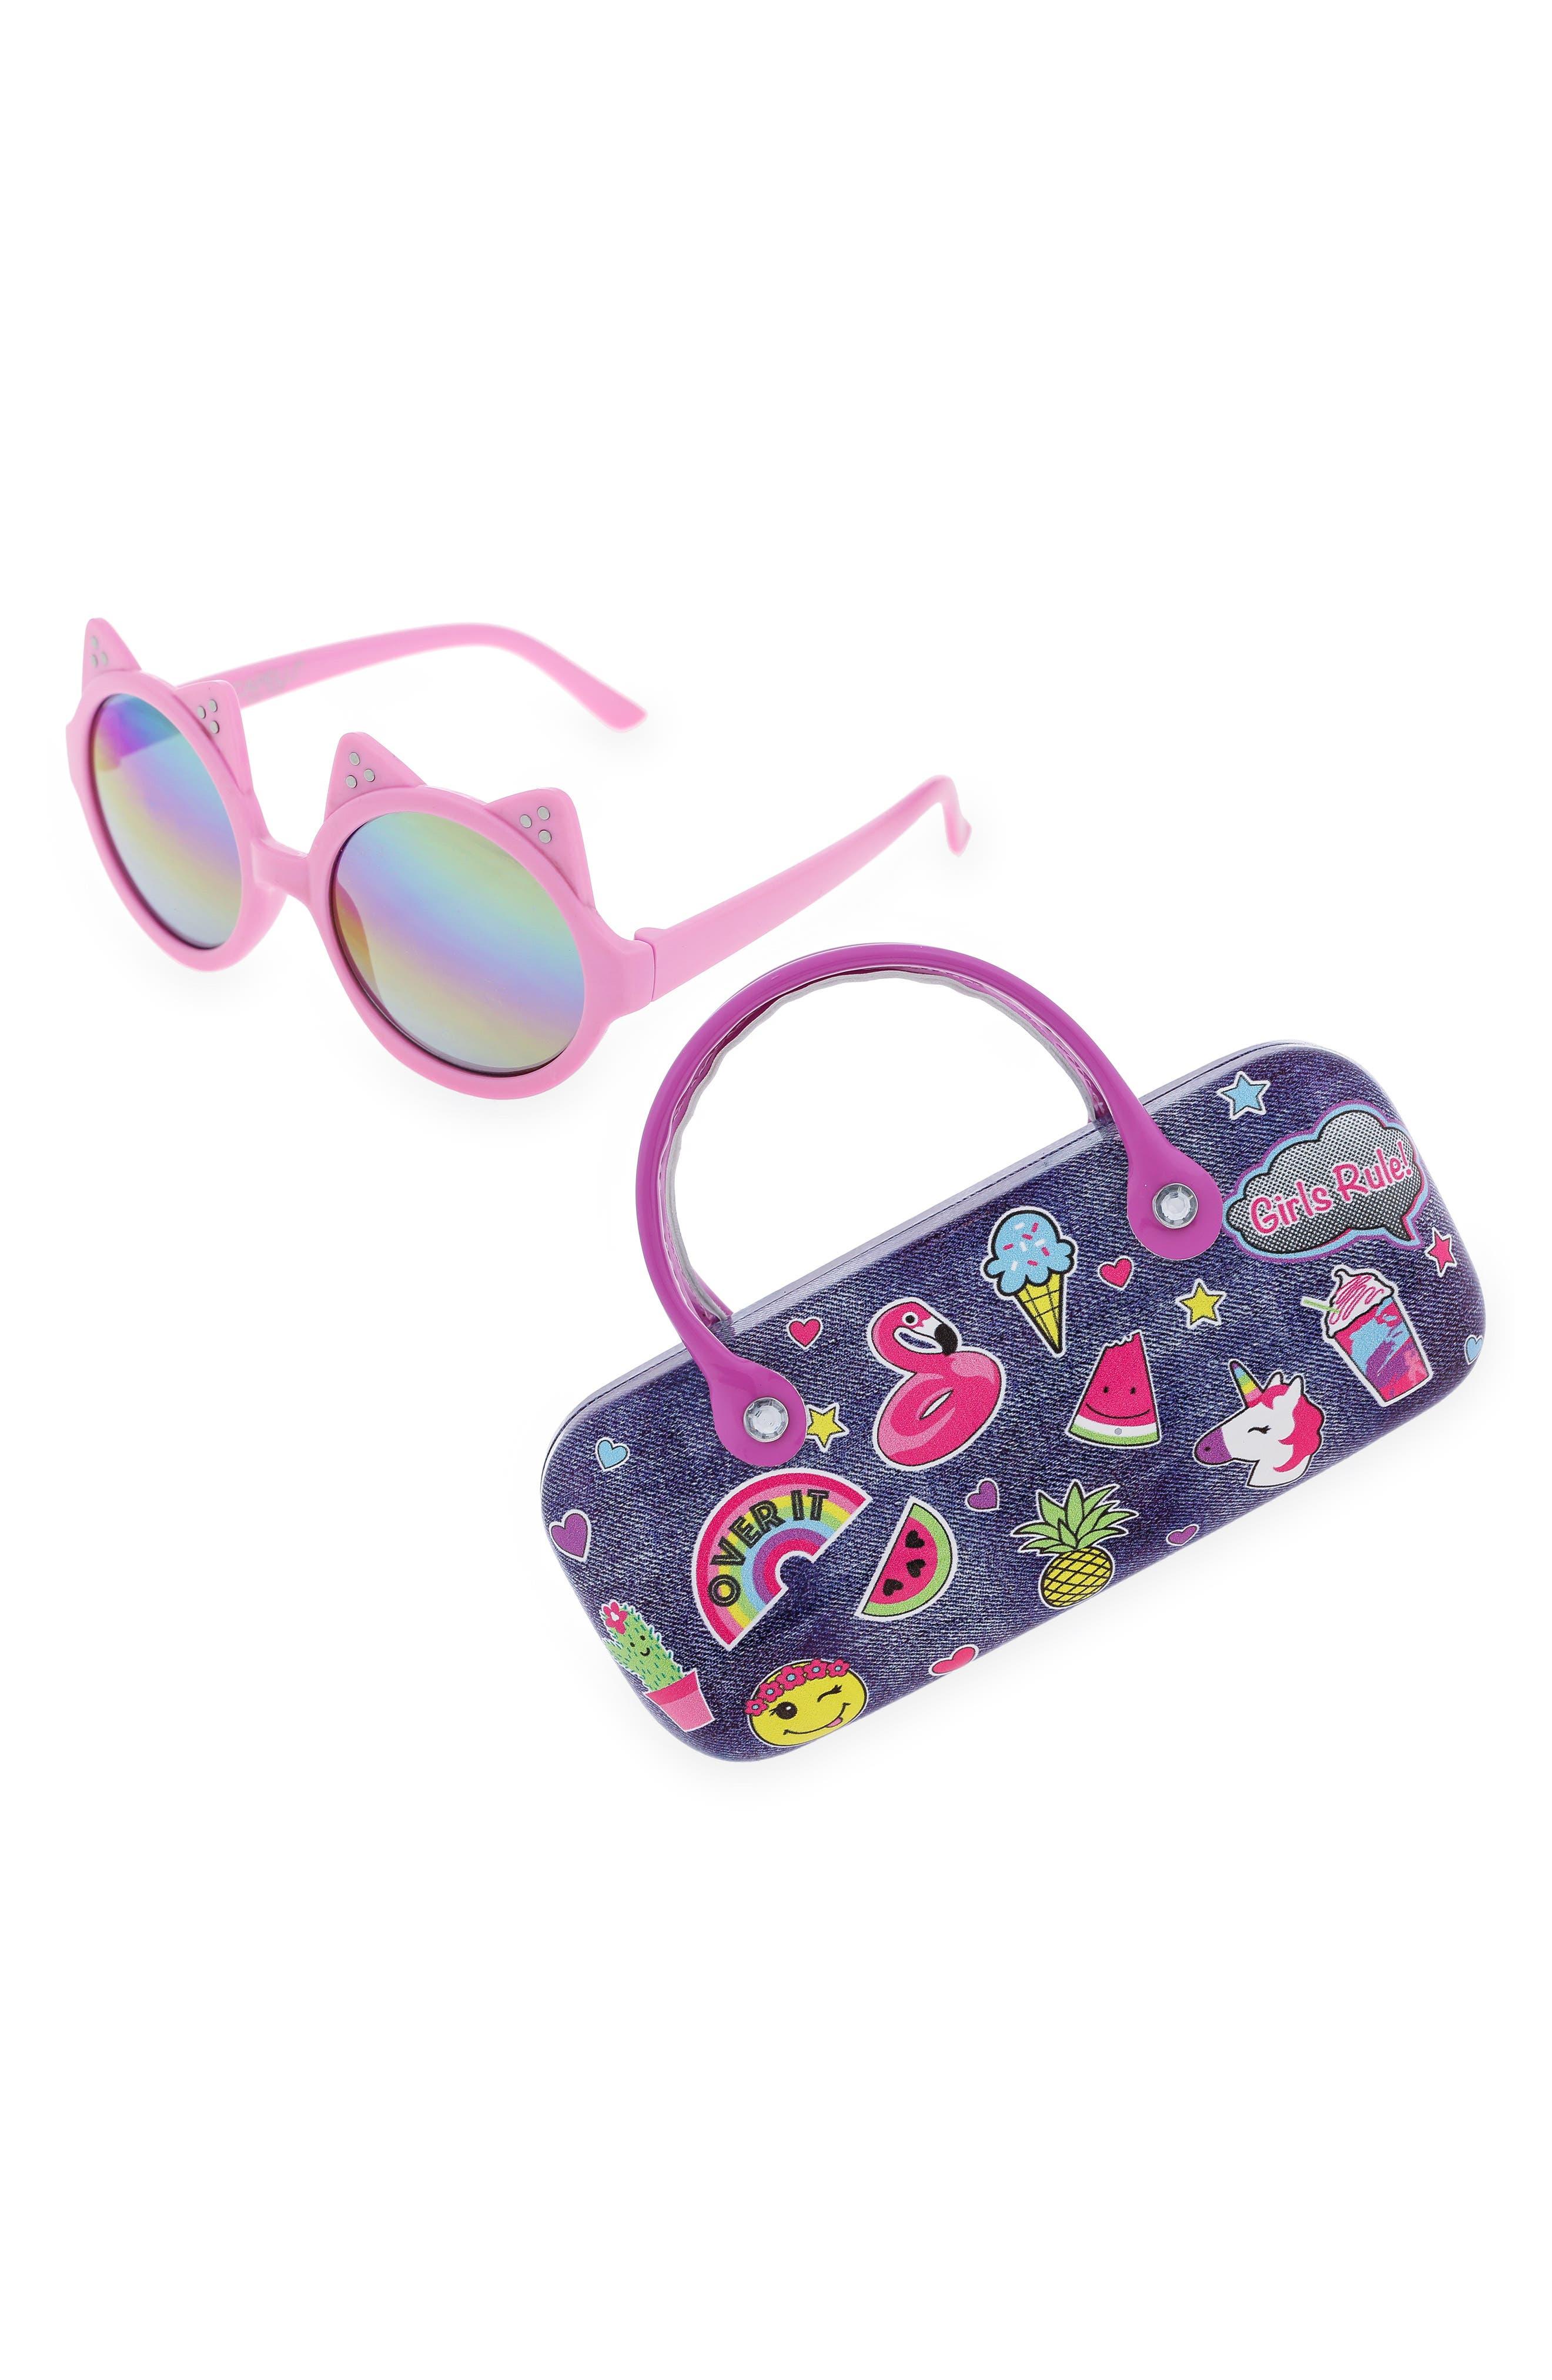 CAPELLI NEW YORK, Rainbow Lens Cat Ear Round Sunglasses, Alternate thumbnail 2, color, MULTI COMBO